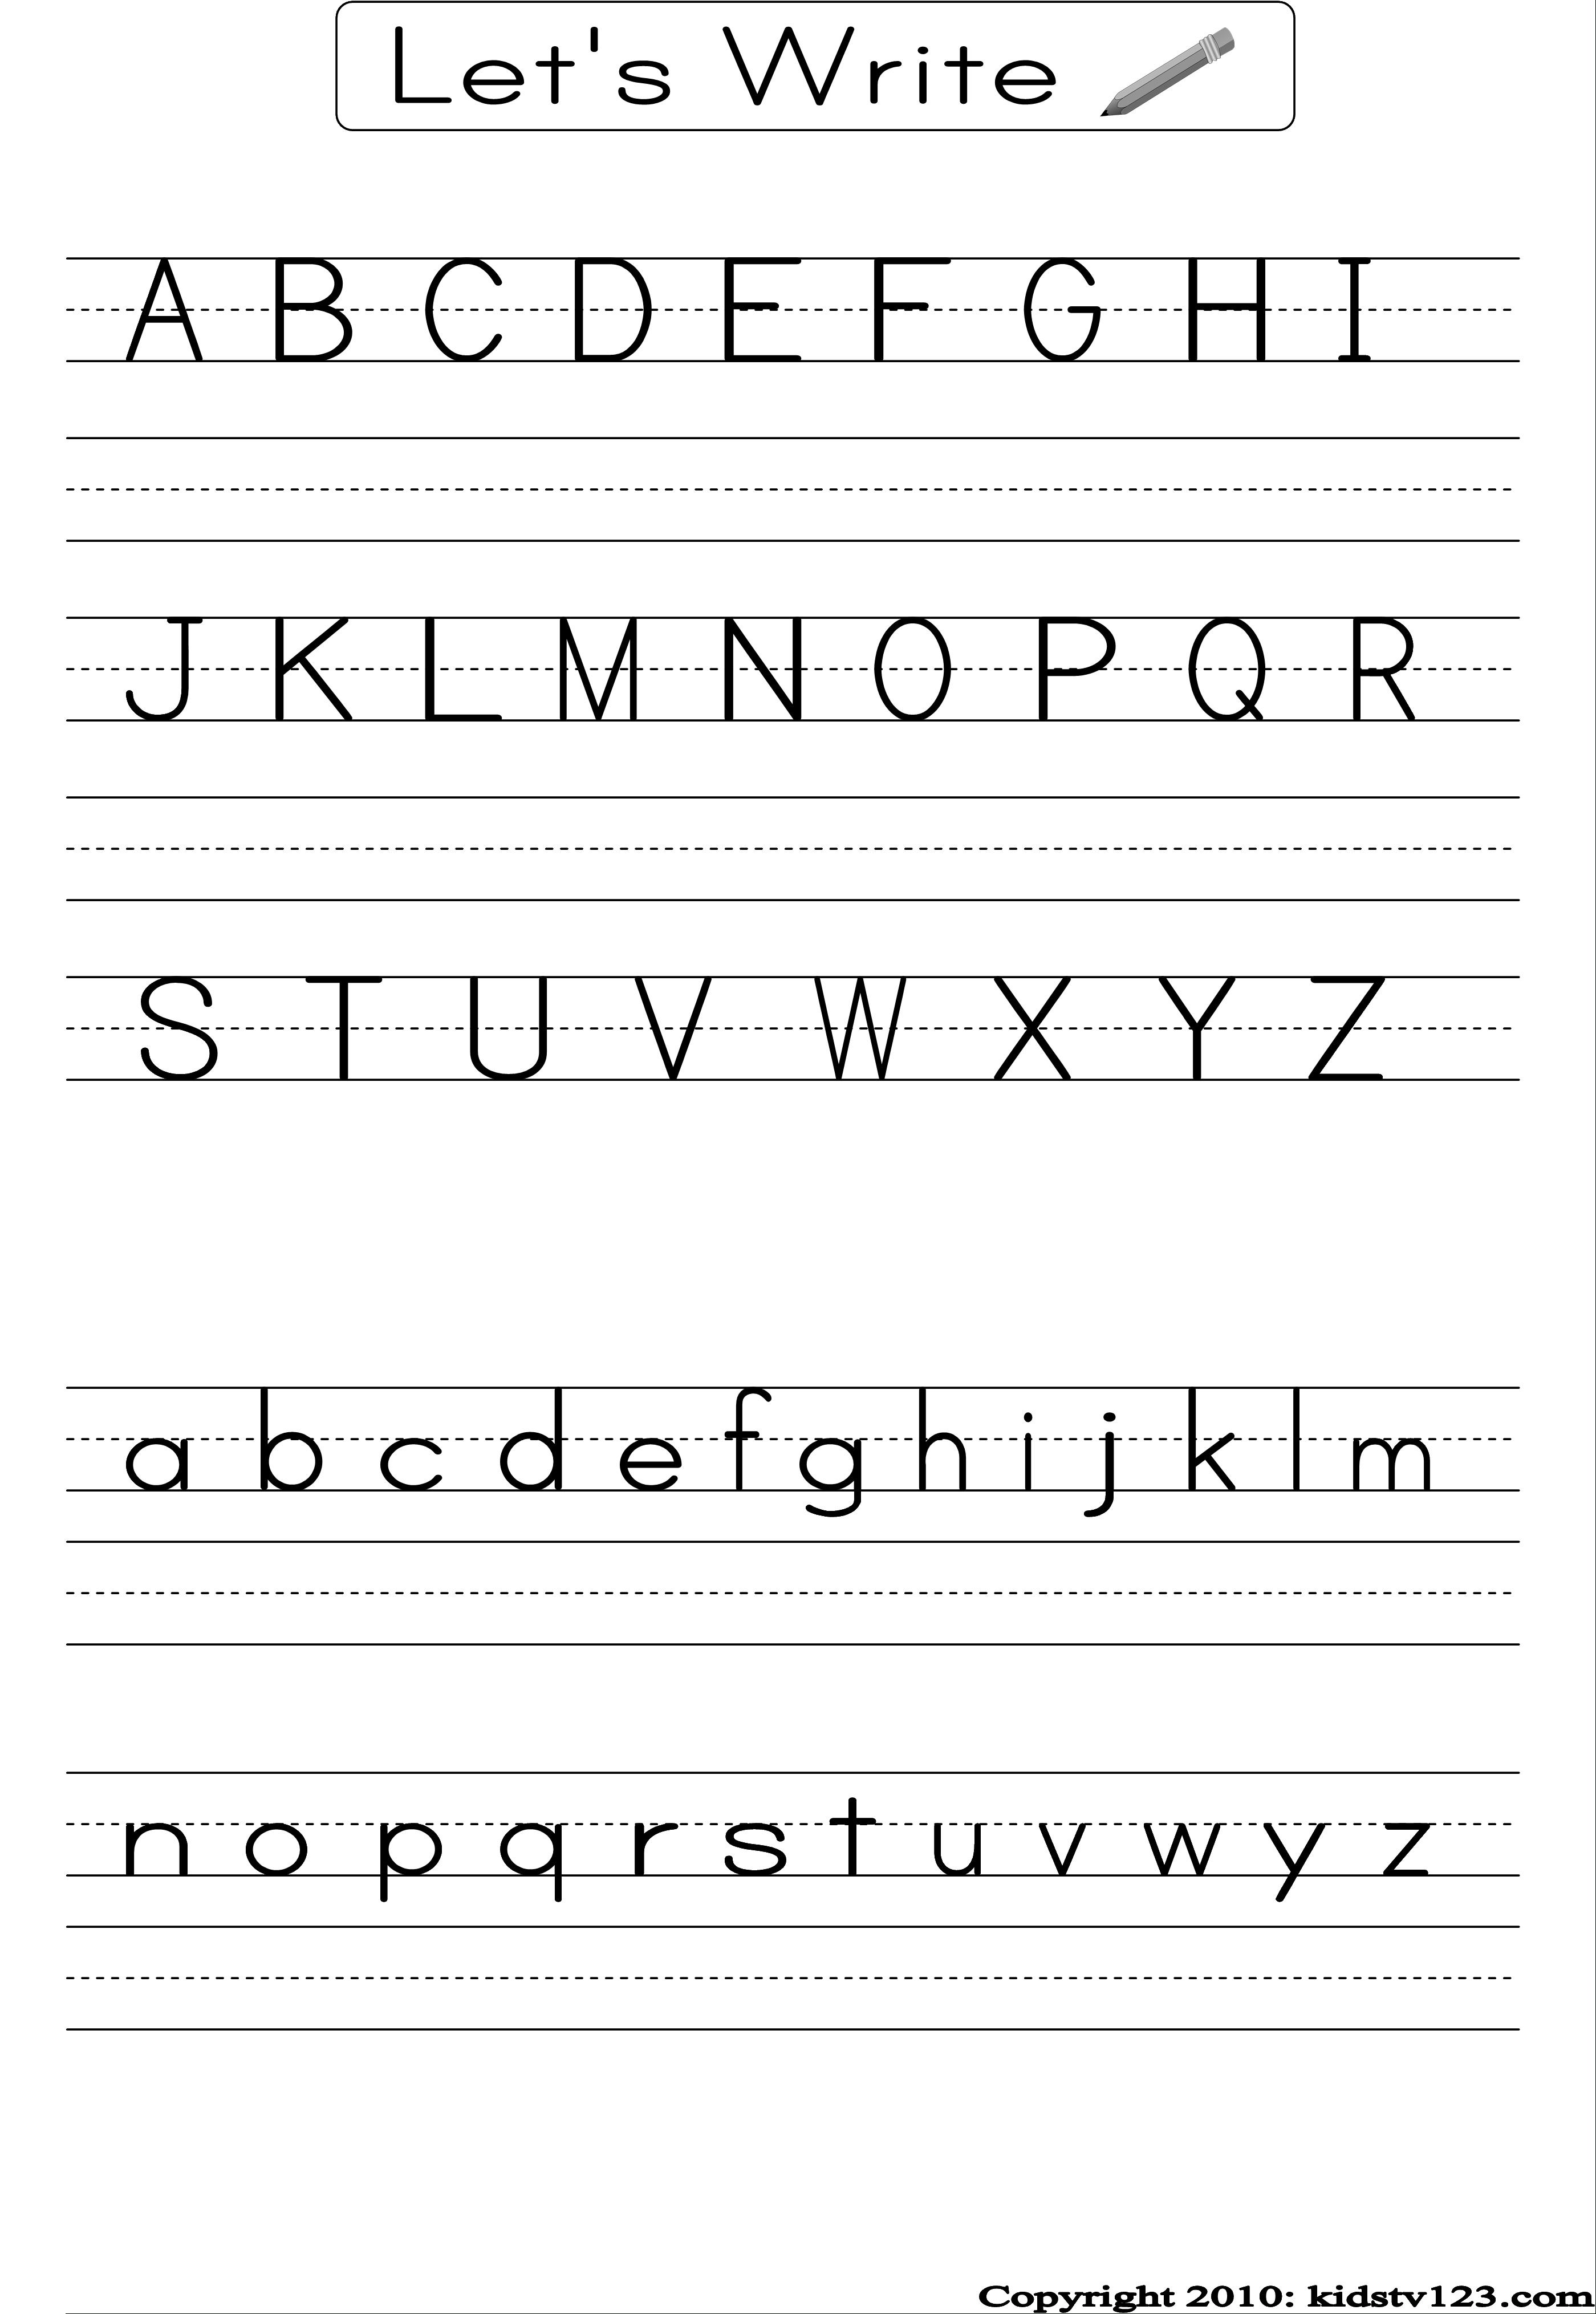 Free Printable Alphabet Worksheets, Preschool Writing And Pattern - Preschool Writing Worksheets Free Printable